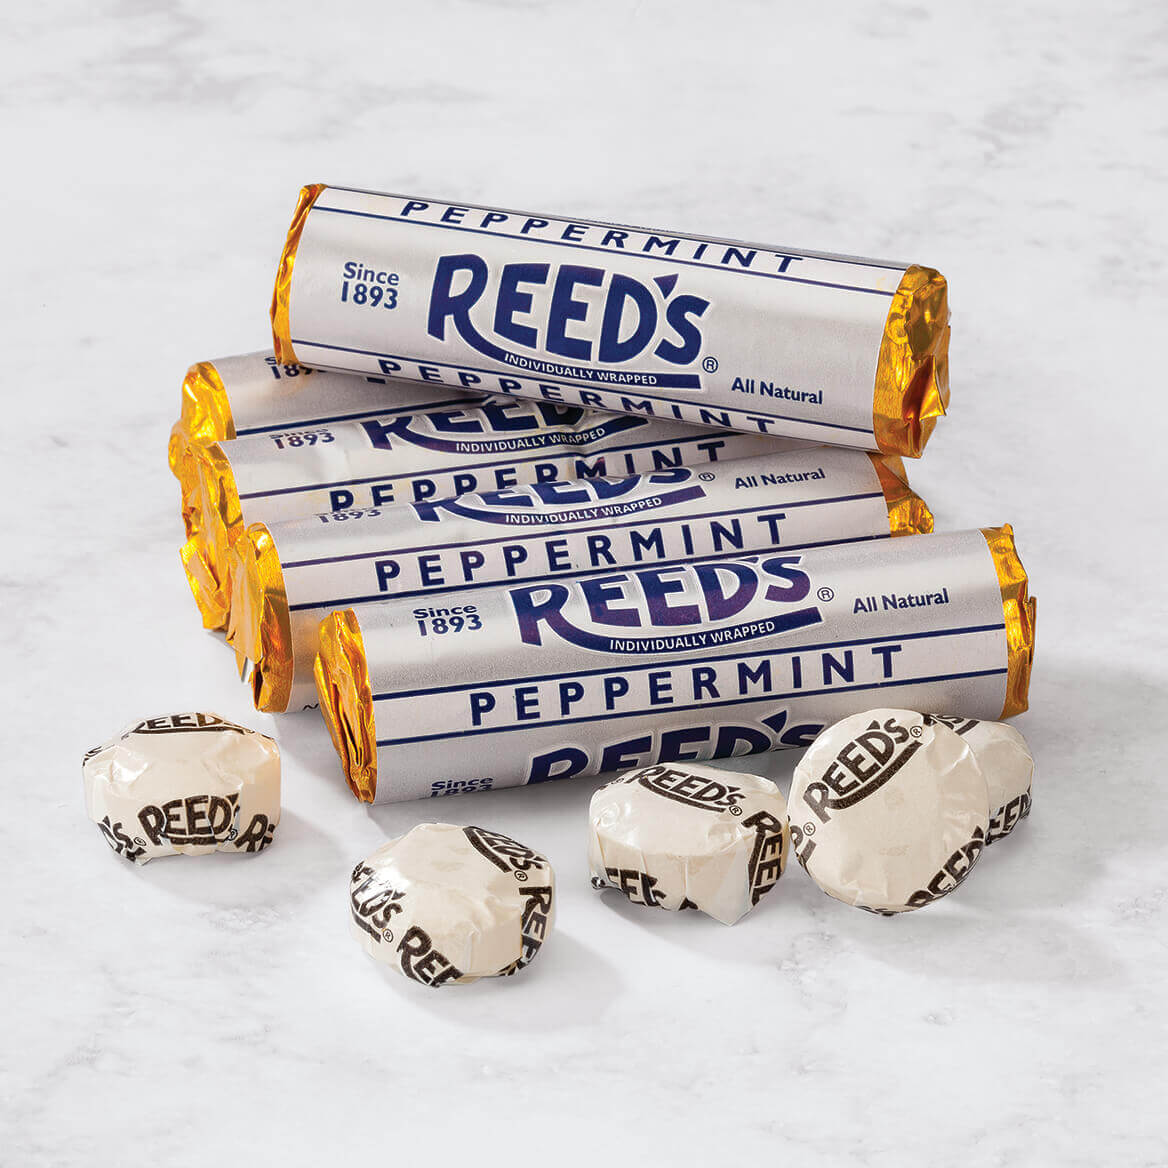 Reeds Peppermint 1.01 oz. Set of 6-368968